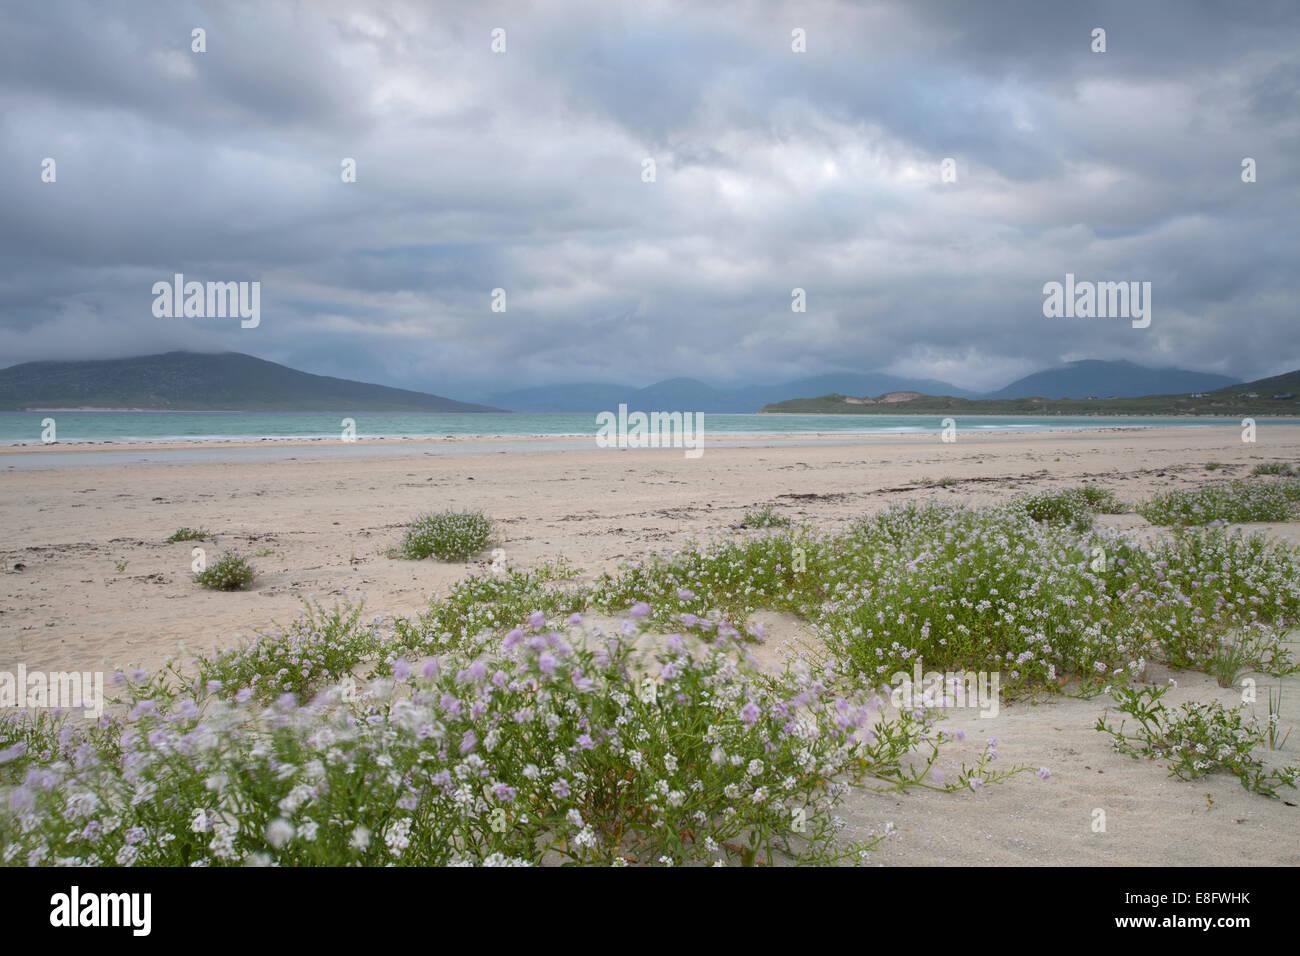 Seilebost beach pink flowers Isle of Harris, Scotland - Stock Image